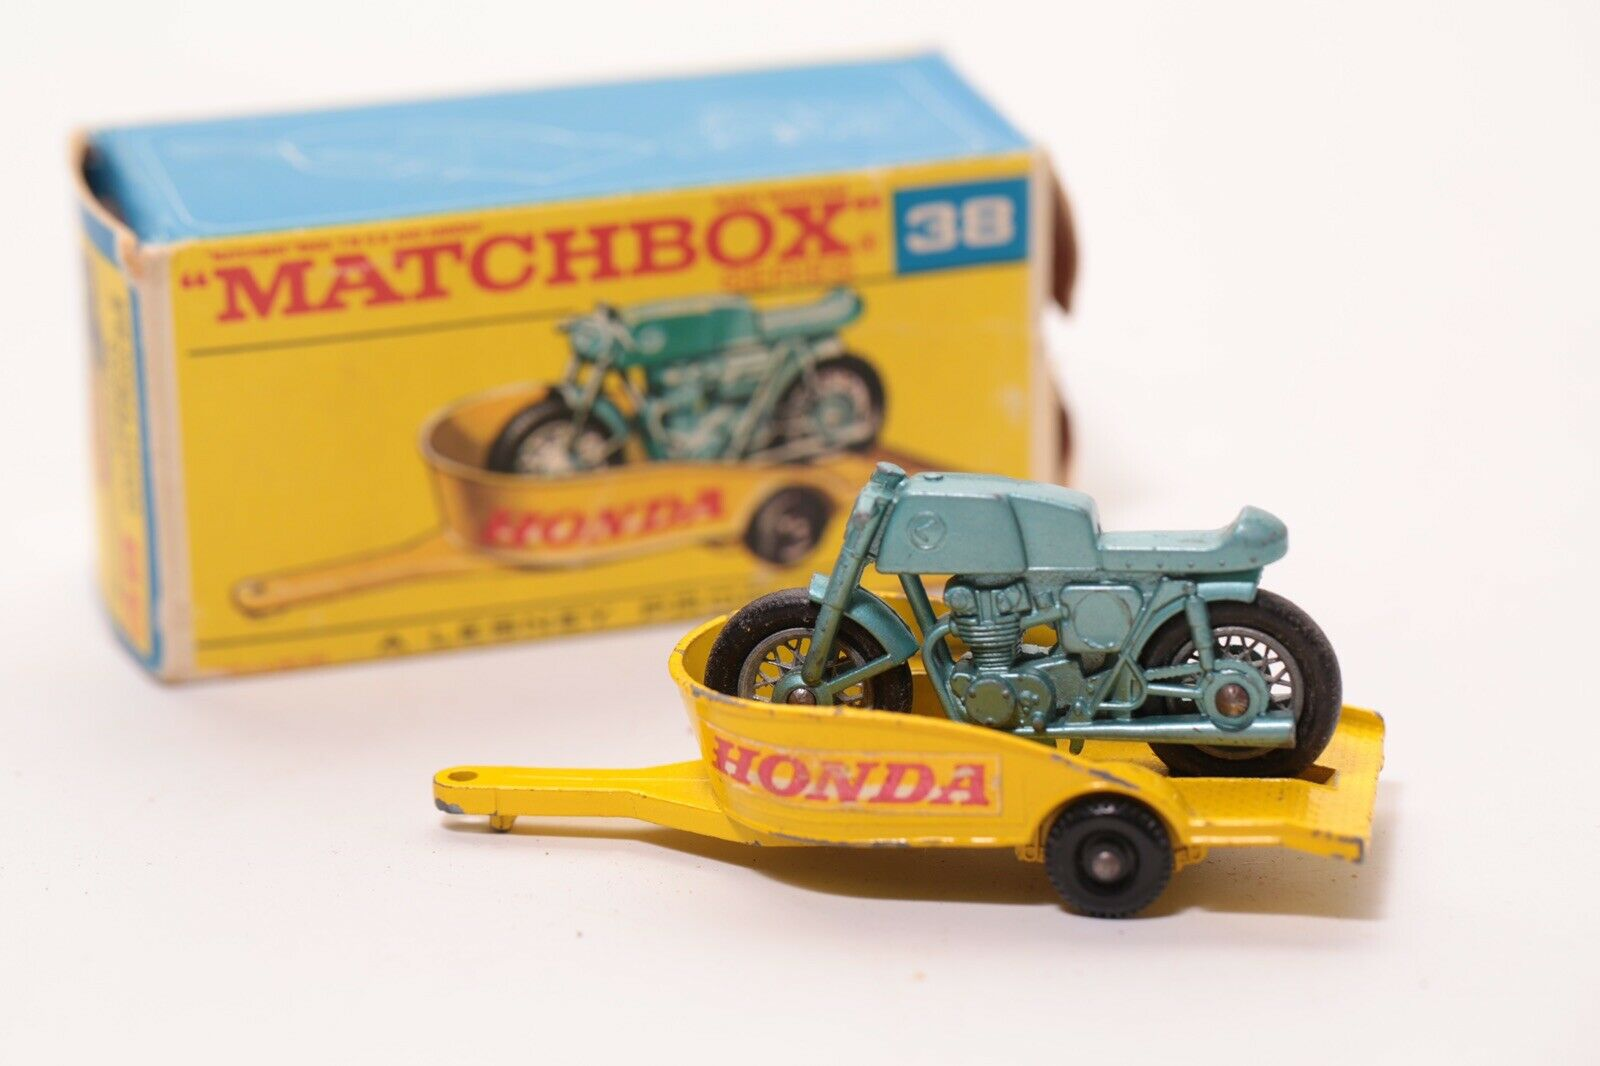 Vintage Matchbox Honda Motorcycle & Trailer 38 Original Box